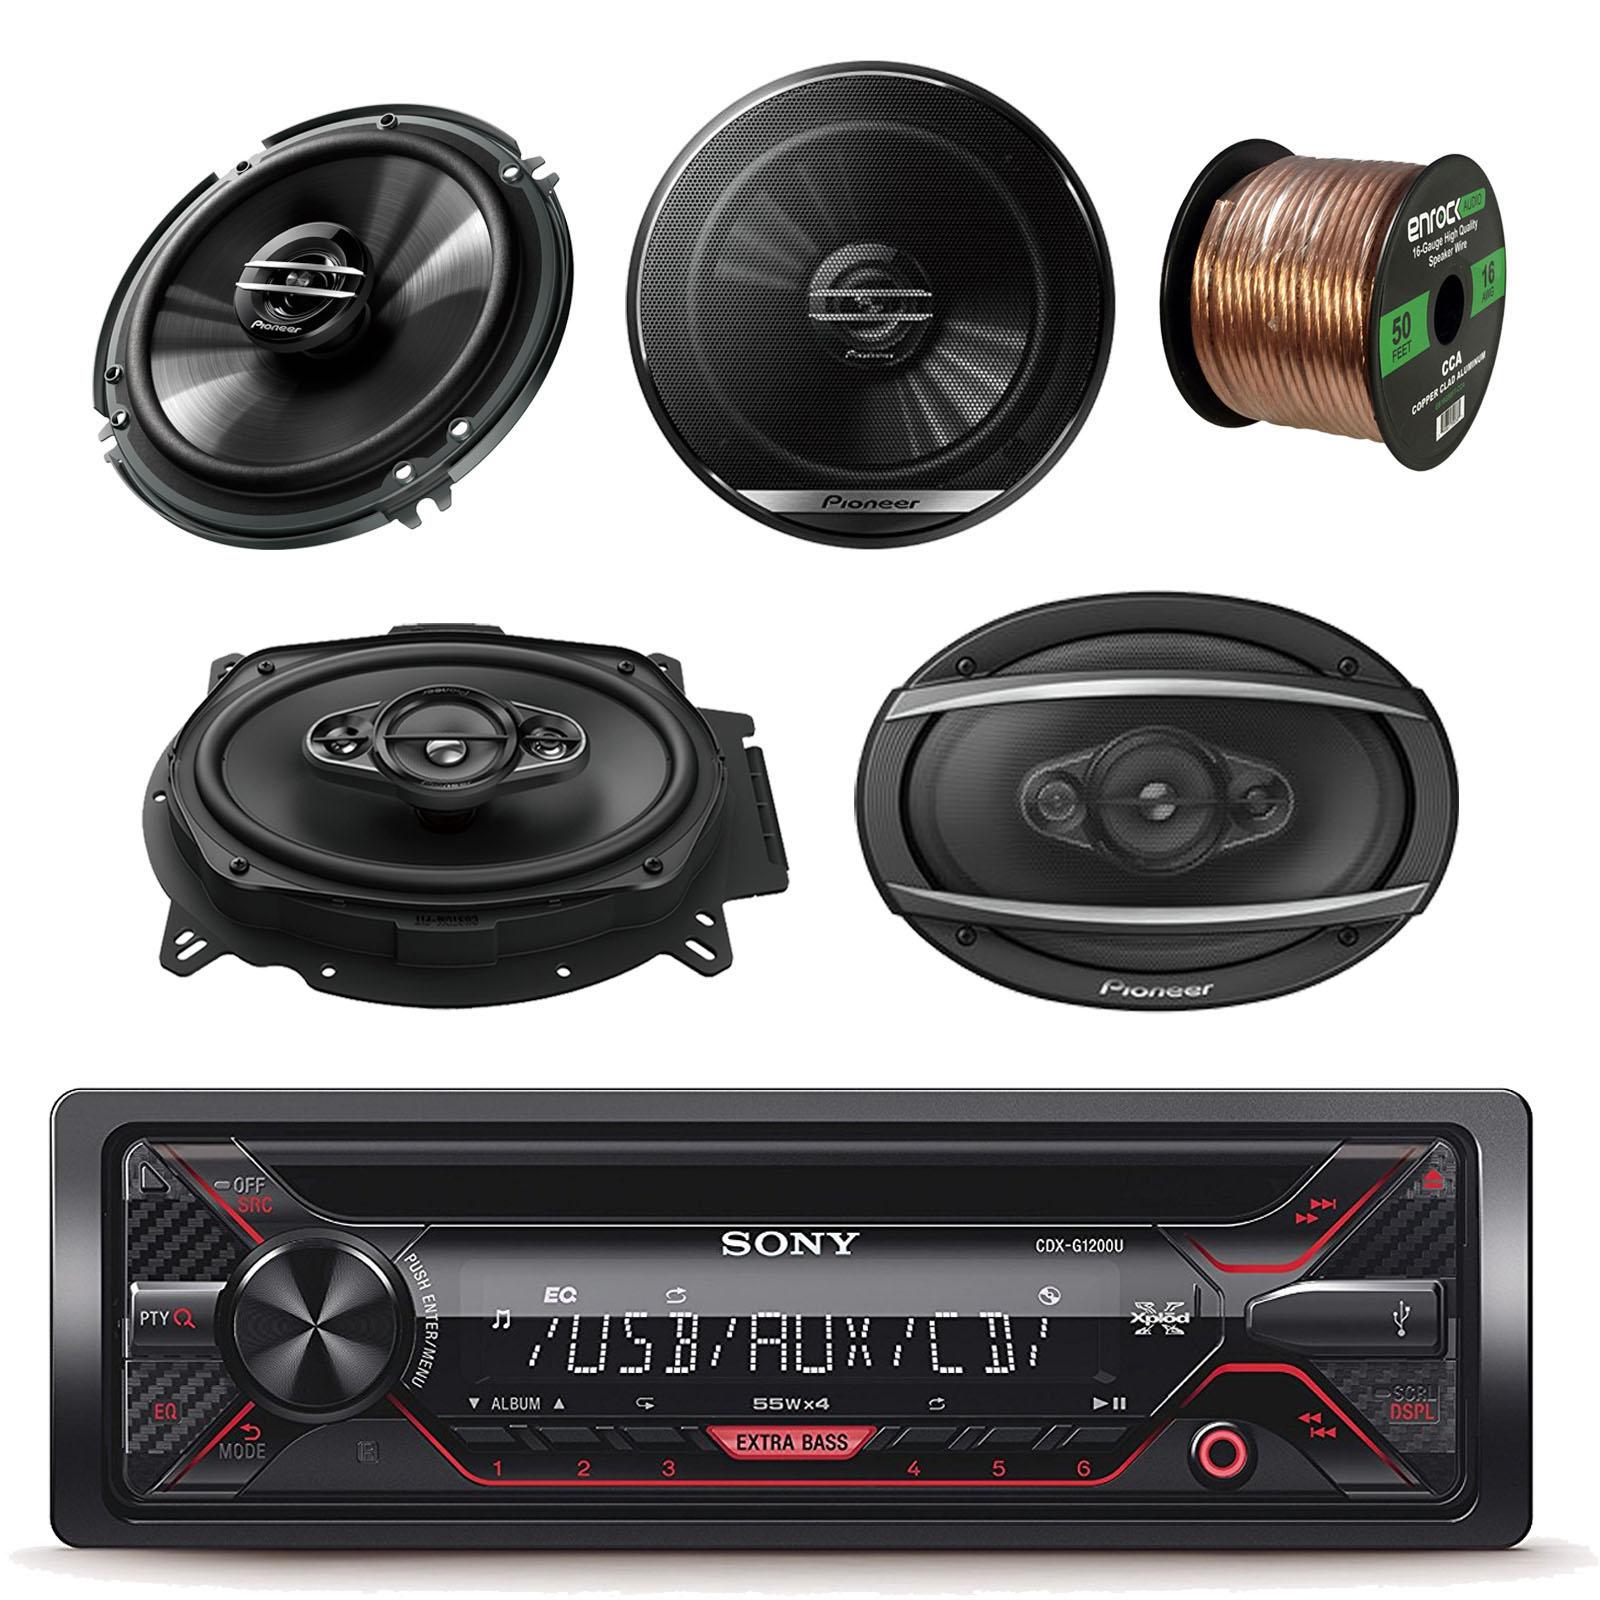 "Sony Xplod CDX-G1200U Cd Receiver with 52x4W Amp With Pioneer 6.5"" 2 Way Speakers (Pair), Pioneer TSA6960F 6x9 Inch 420W 3-Way Car Coaxial Speaker (Pair) & Enrock Audio 16-Gauge 50 Ft Speaker Wire"